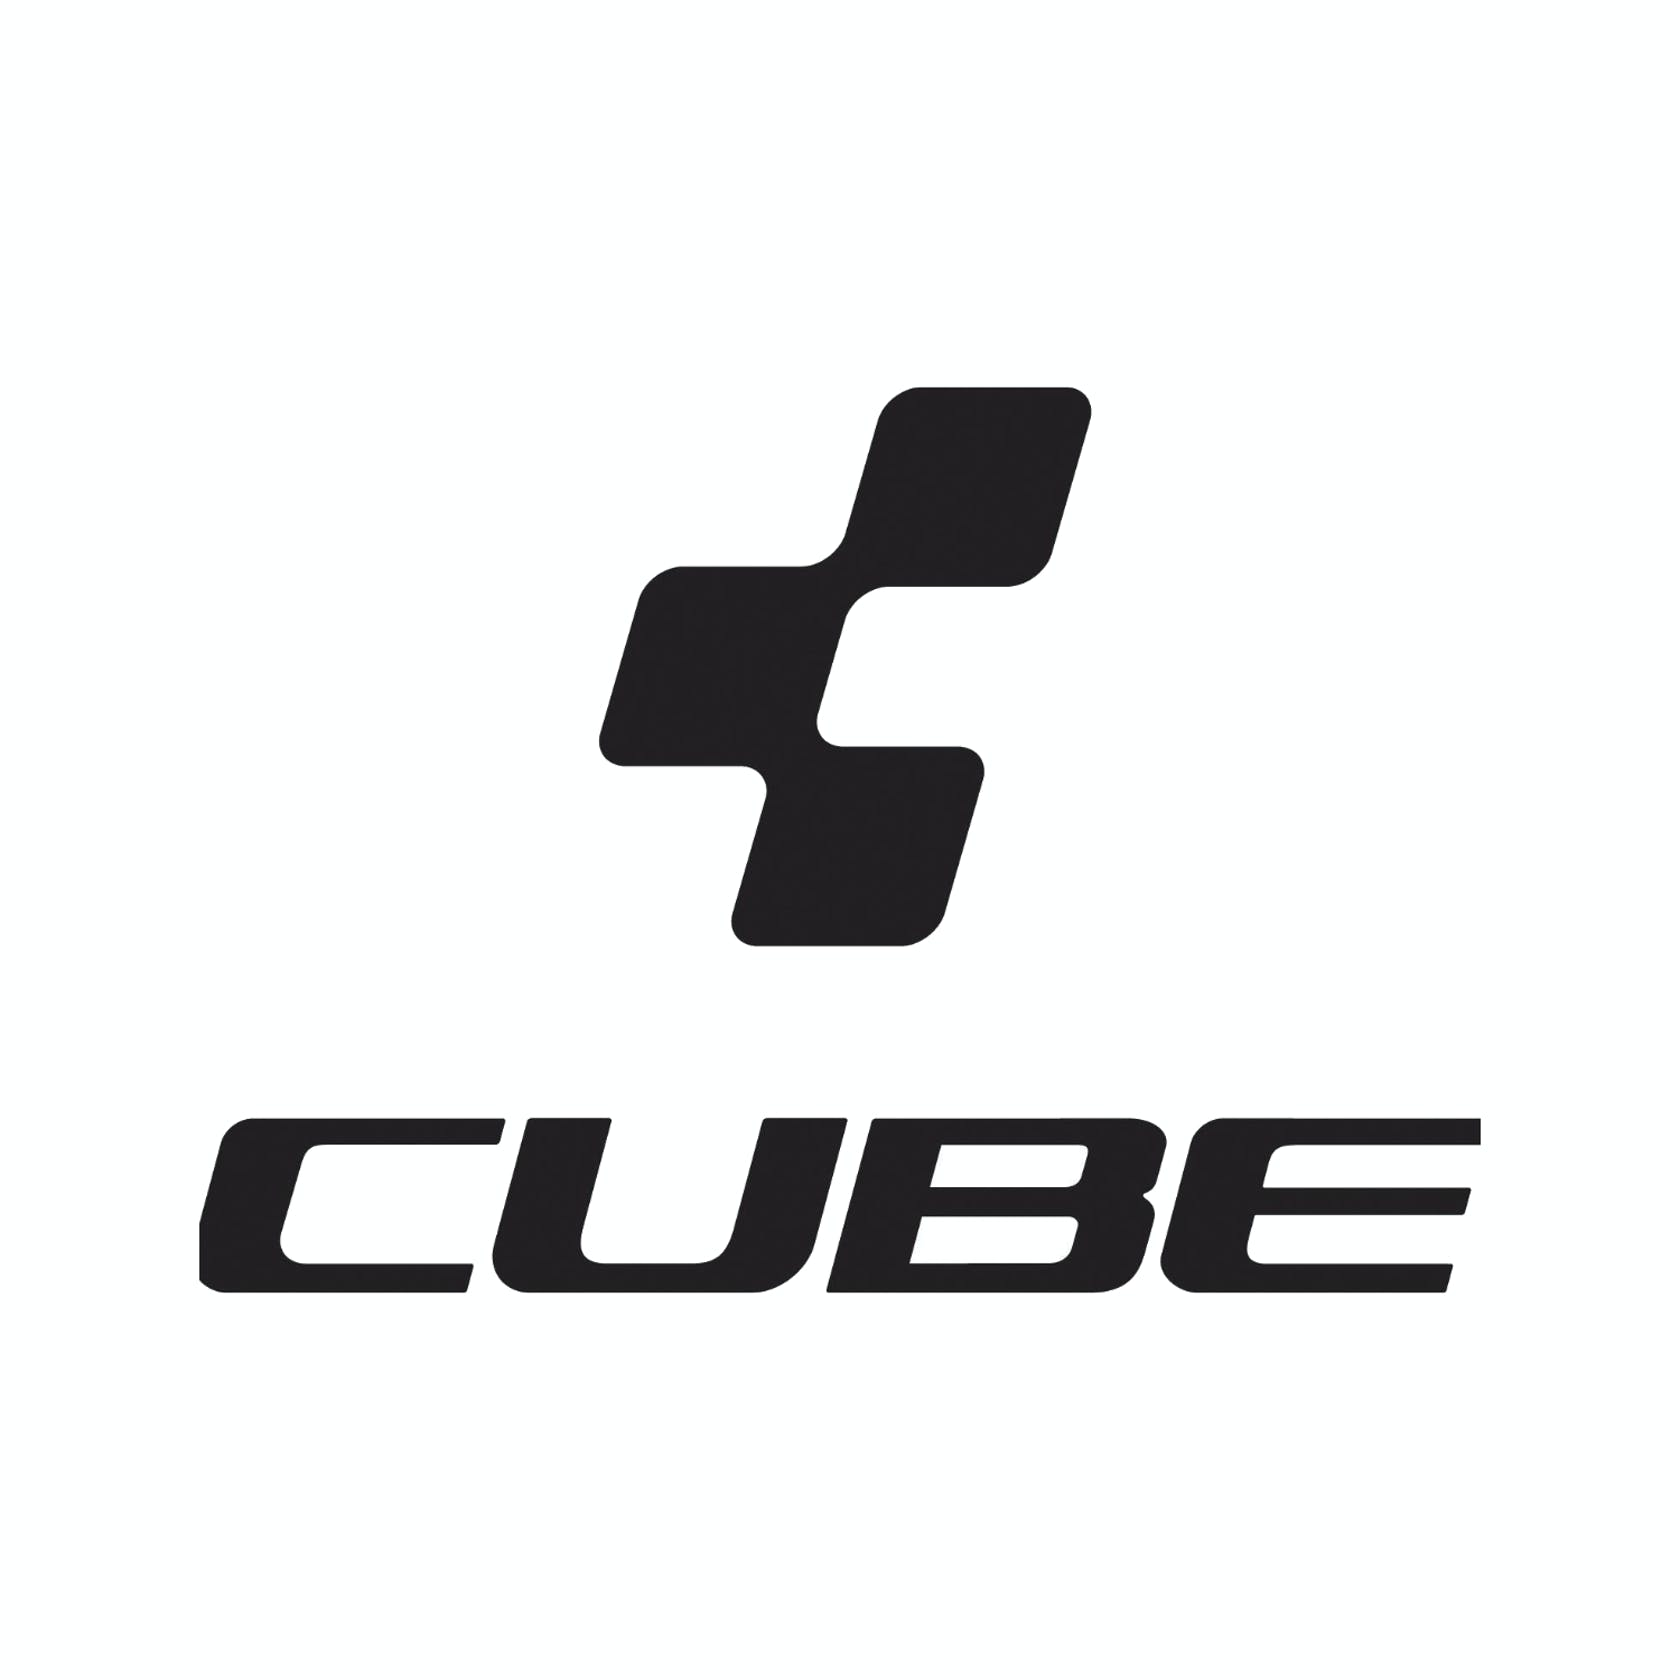 Cube onlineshop